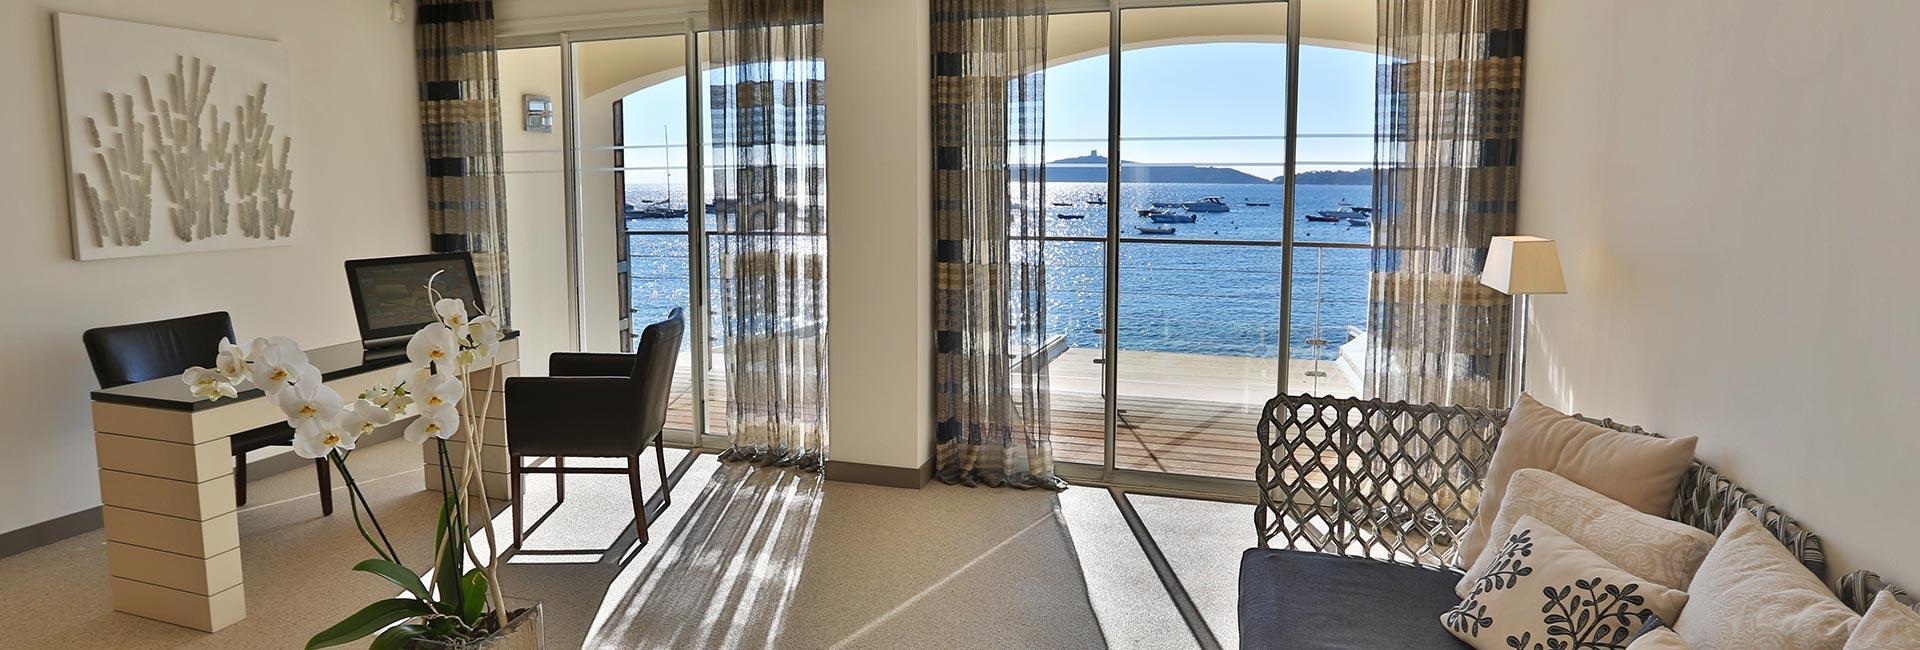 reception hotel 4 étoiles le pinarello à Porto-Vecchio en Corse